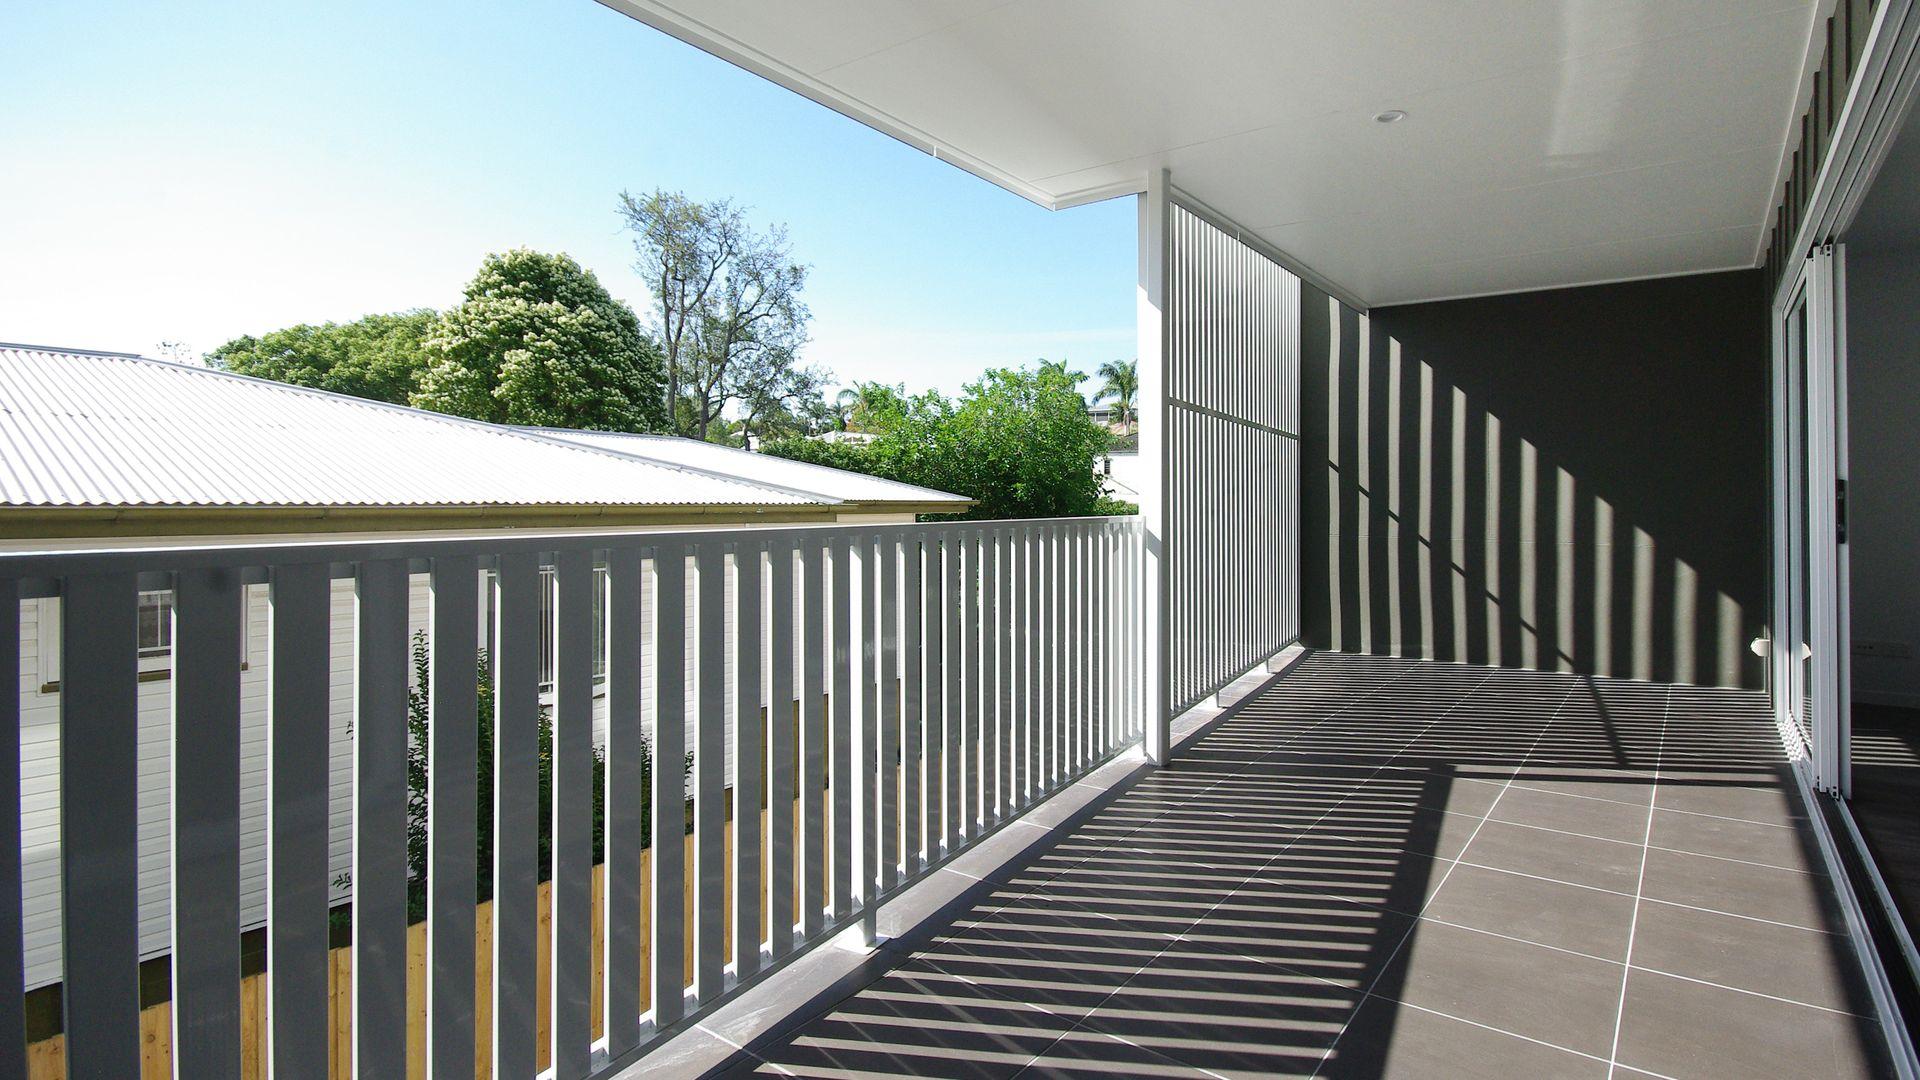 2/164 Norman Avenue, Norman Park QLD 4170, Image 7